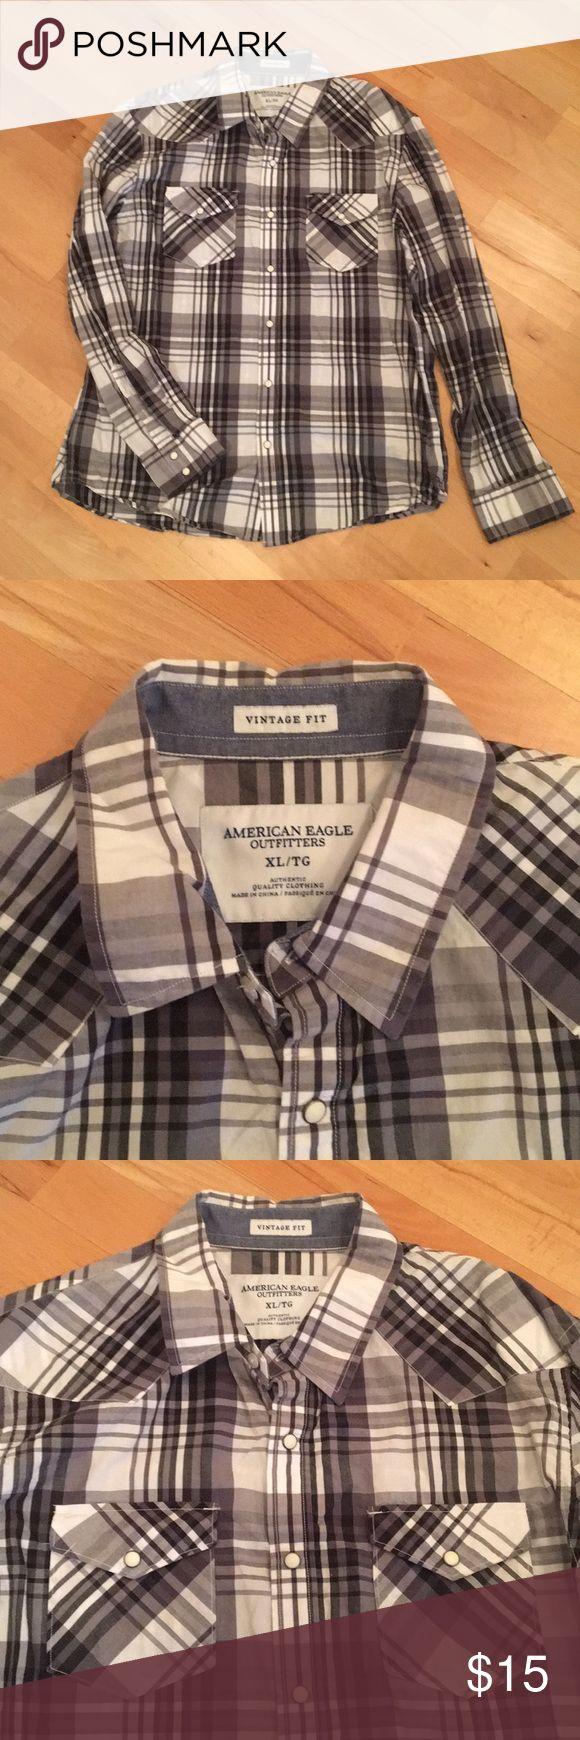 American Eagle Men's Button-down Shirt American Eagle Men's Button-down Shirt in gray and white. Snap button shirt. Good condition American Eagle Outfitters Shirts Casual Button Down Shirts